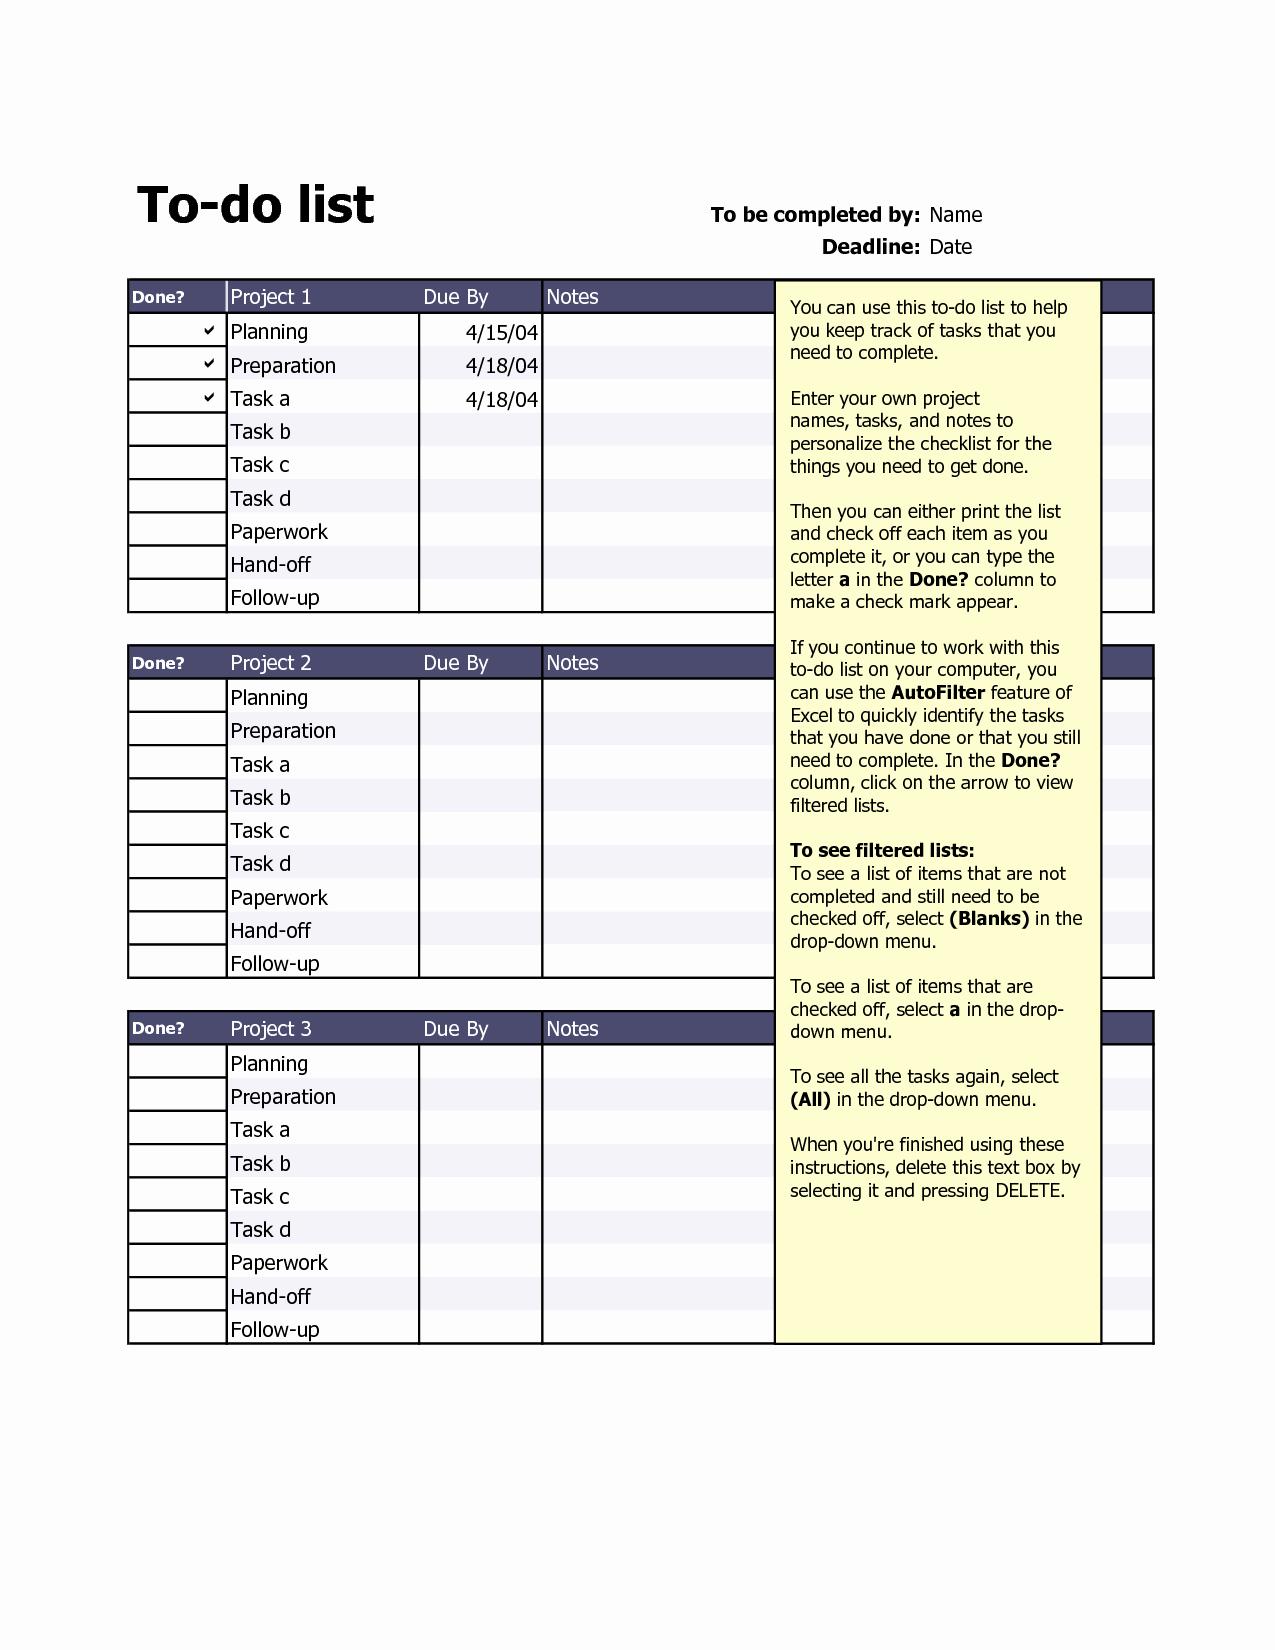 To Do List Excel Templates Unique Best S Of Excel Do List Template to Do Task List